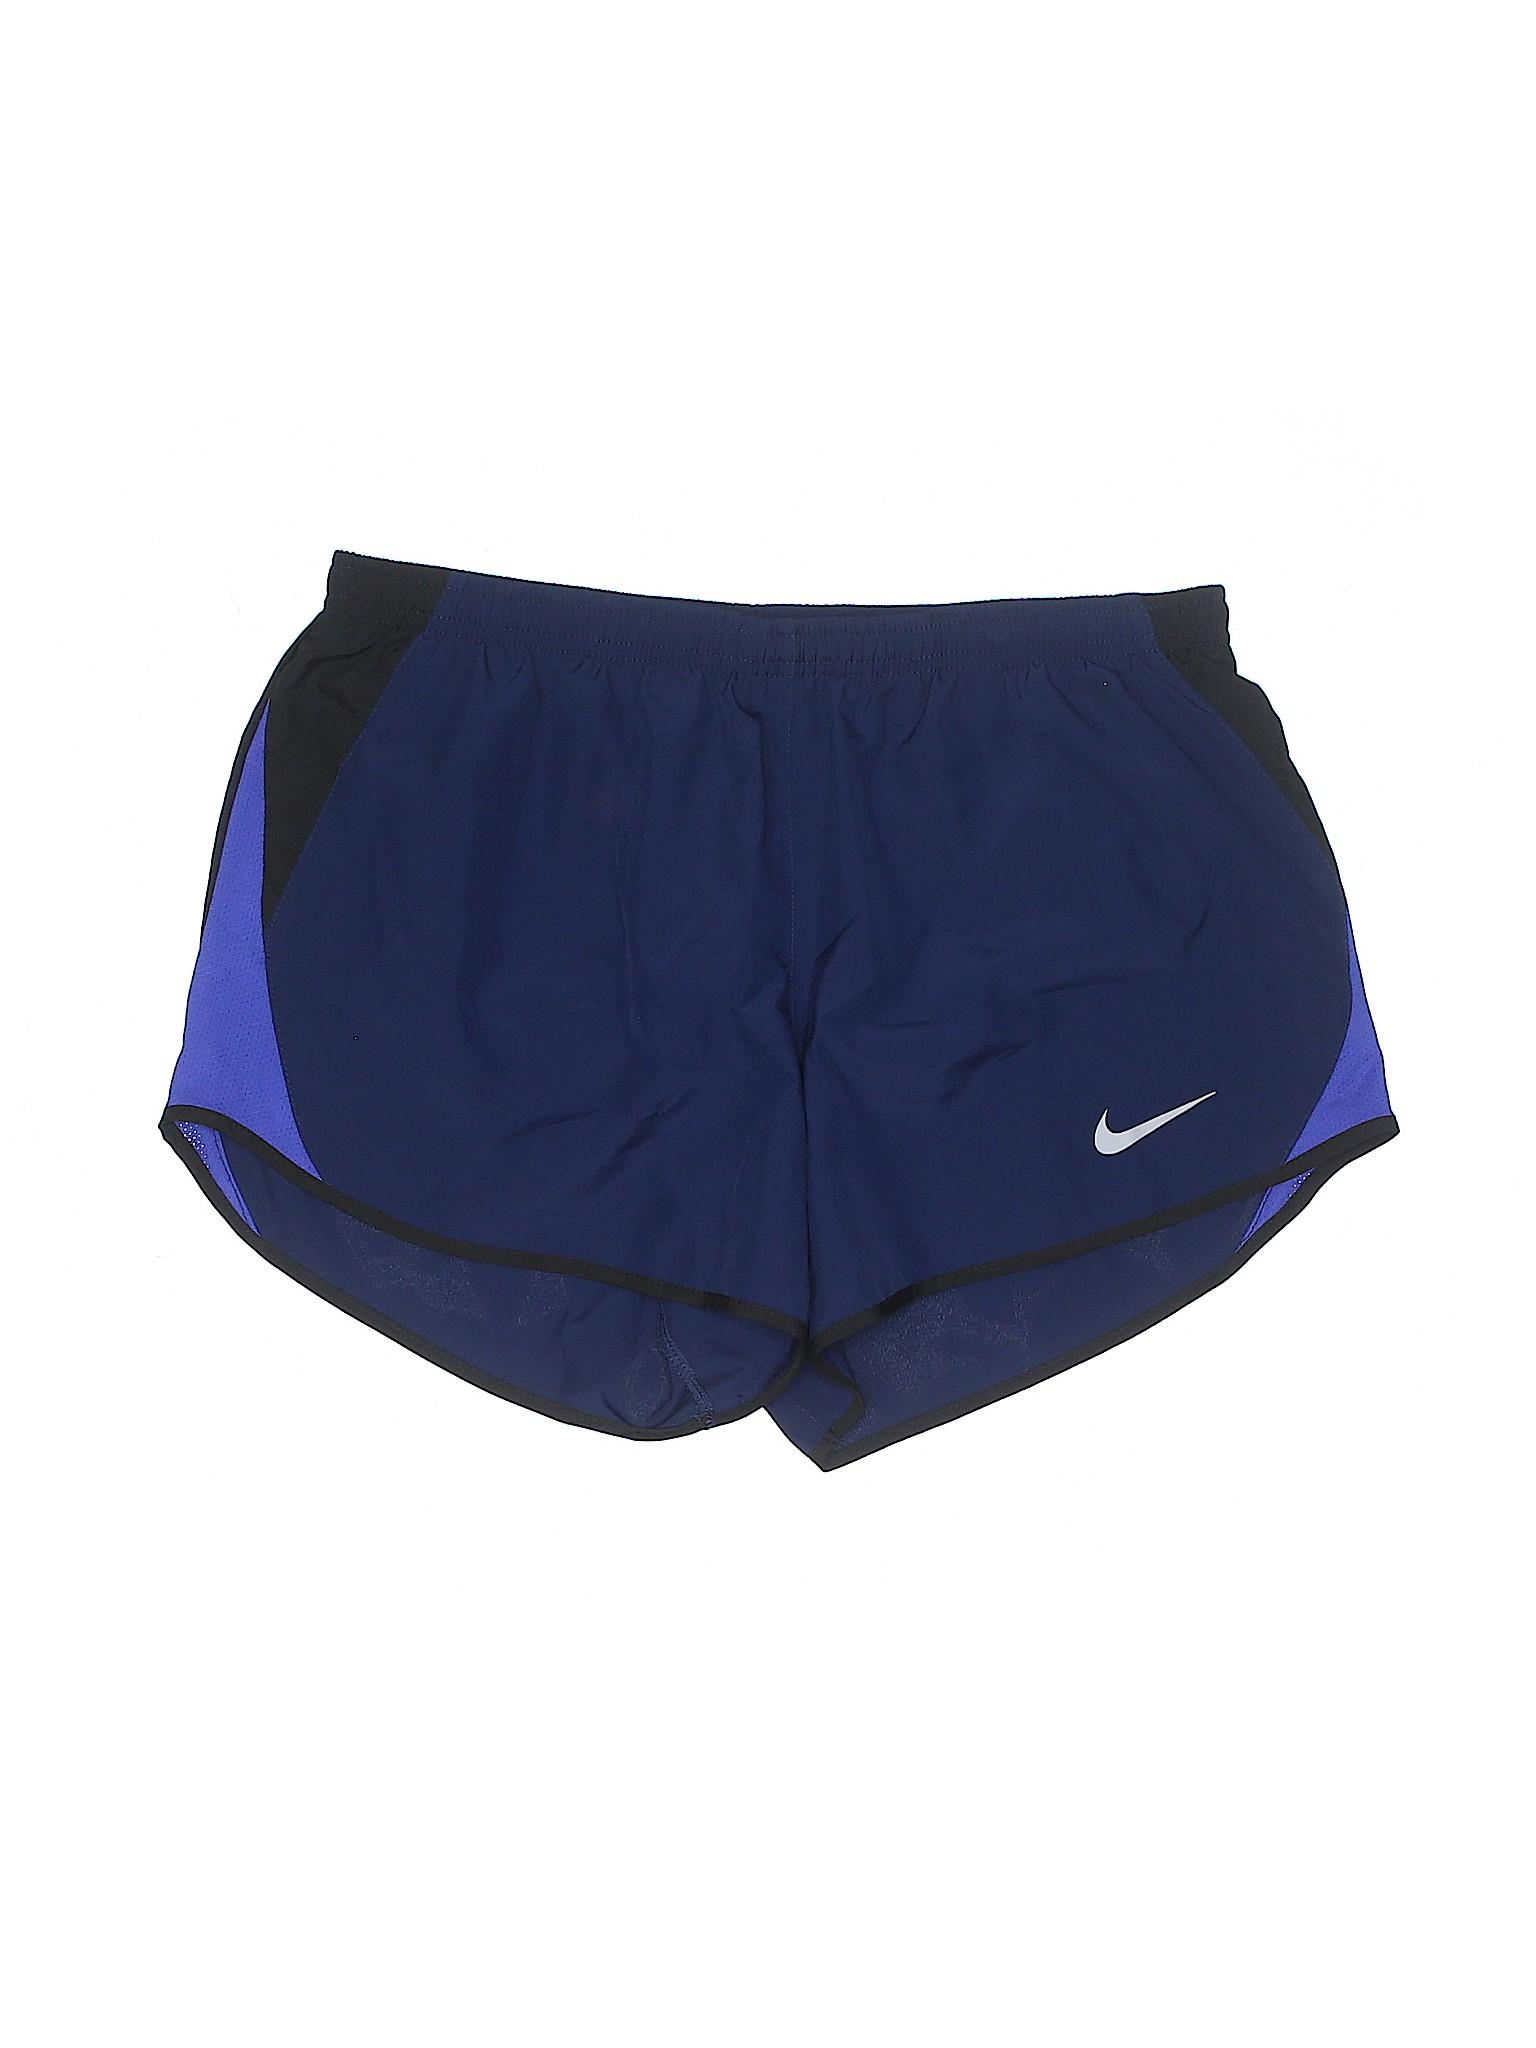 Leisure Shorts Leisure Athletic Nike Athletic Shorts Nike Athletic winter Leisure Nike winter winter 47gq4n8r